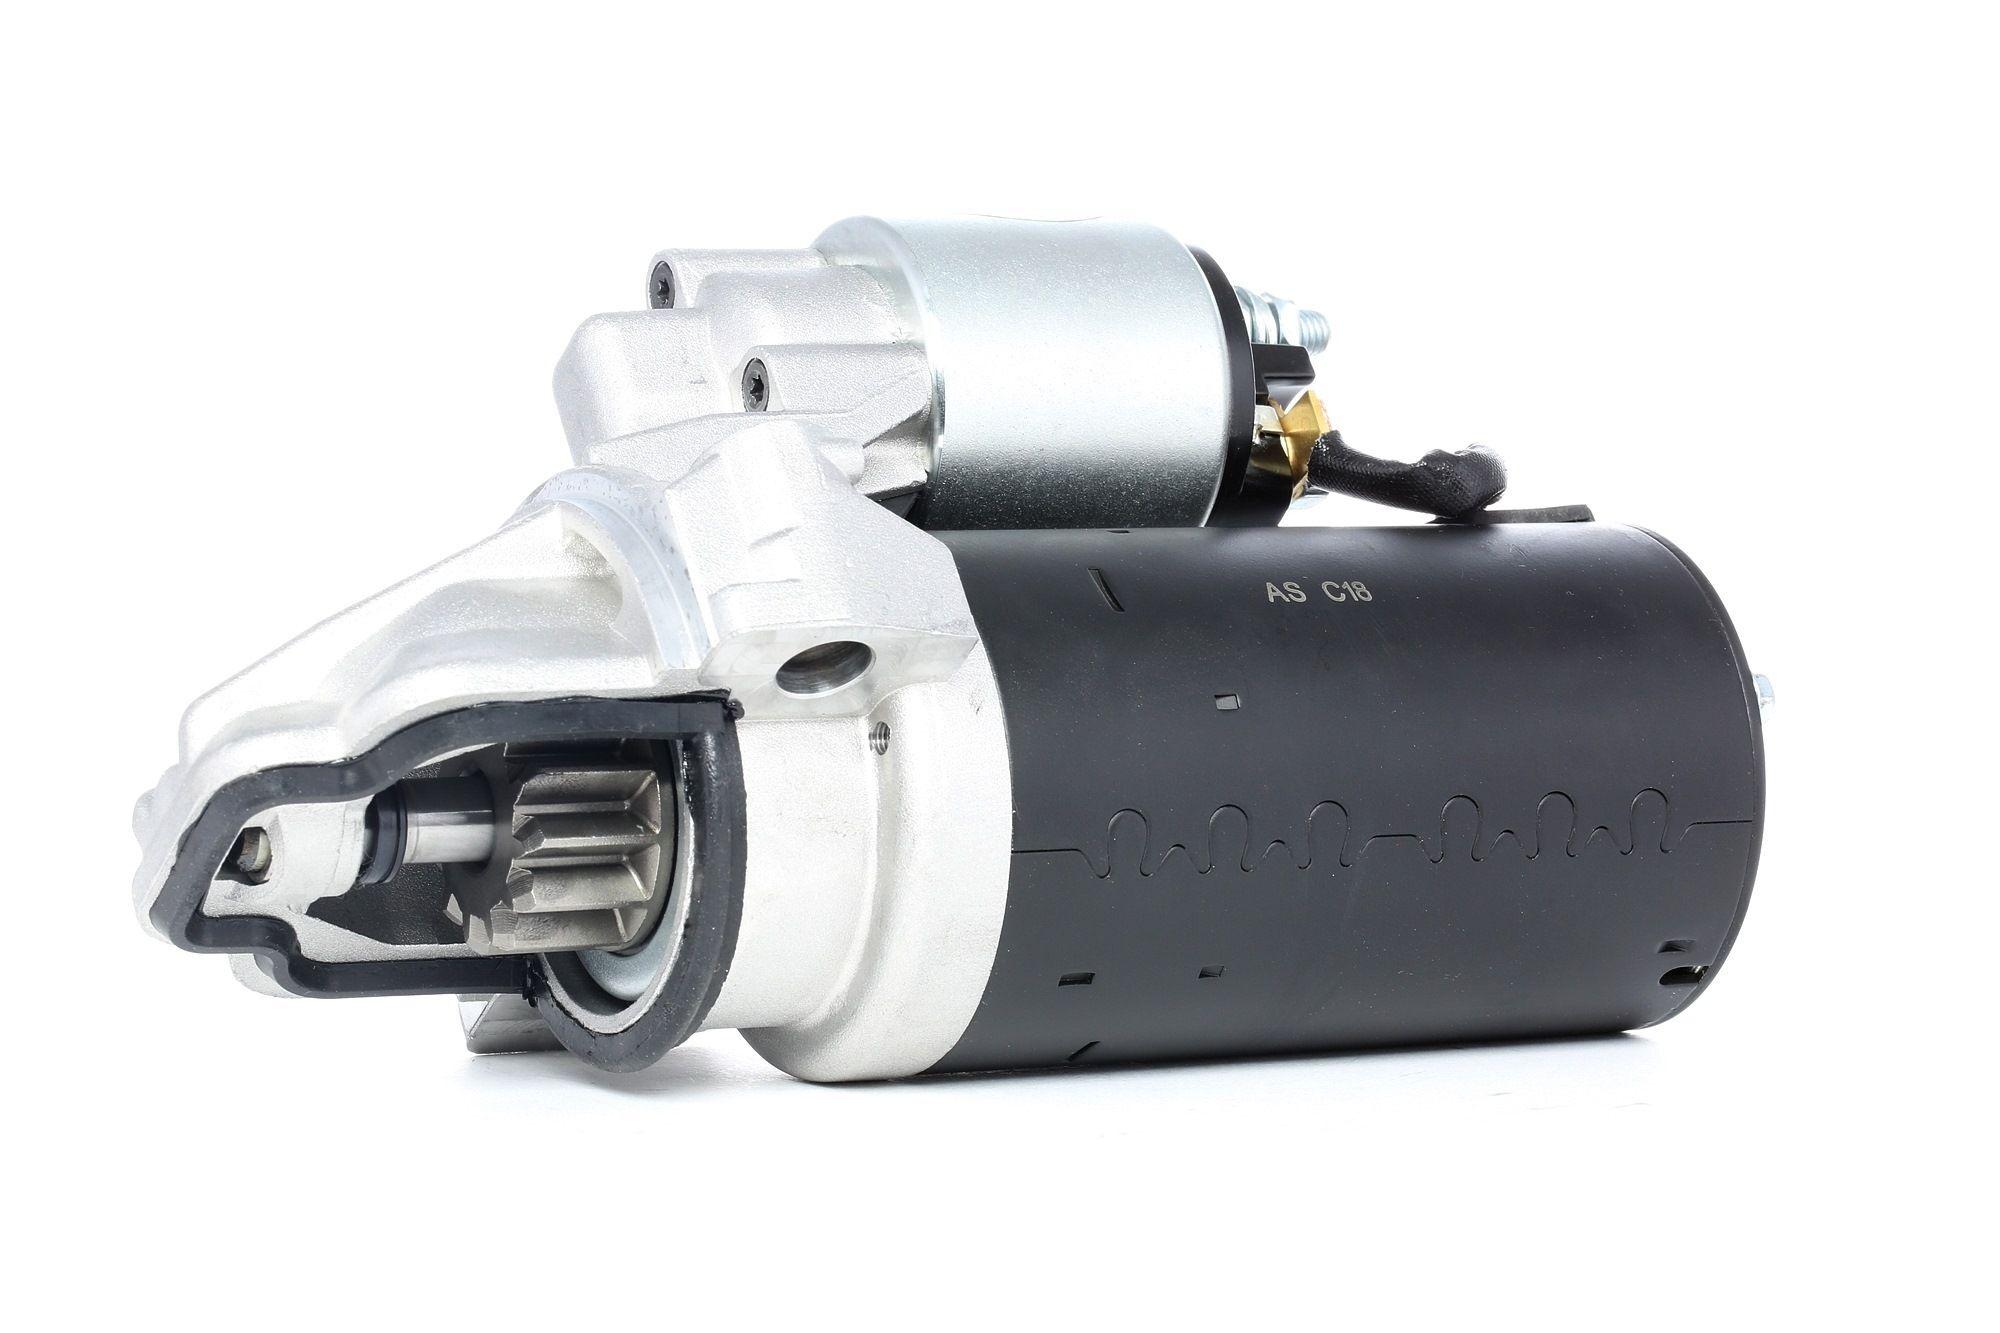 AS-PL Starttimoottori Brand new AS-PL Starter motor D7E32 S0123 Startti,Käynnistinmoottori FORD,FIAT,PEUGEOT,TRANSIT MK-7 Kasten,TRANSIT MK-7 Bus